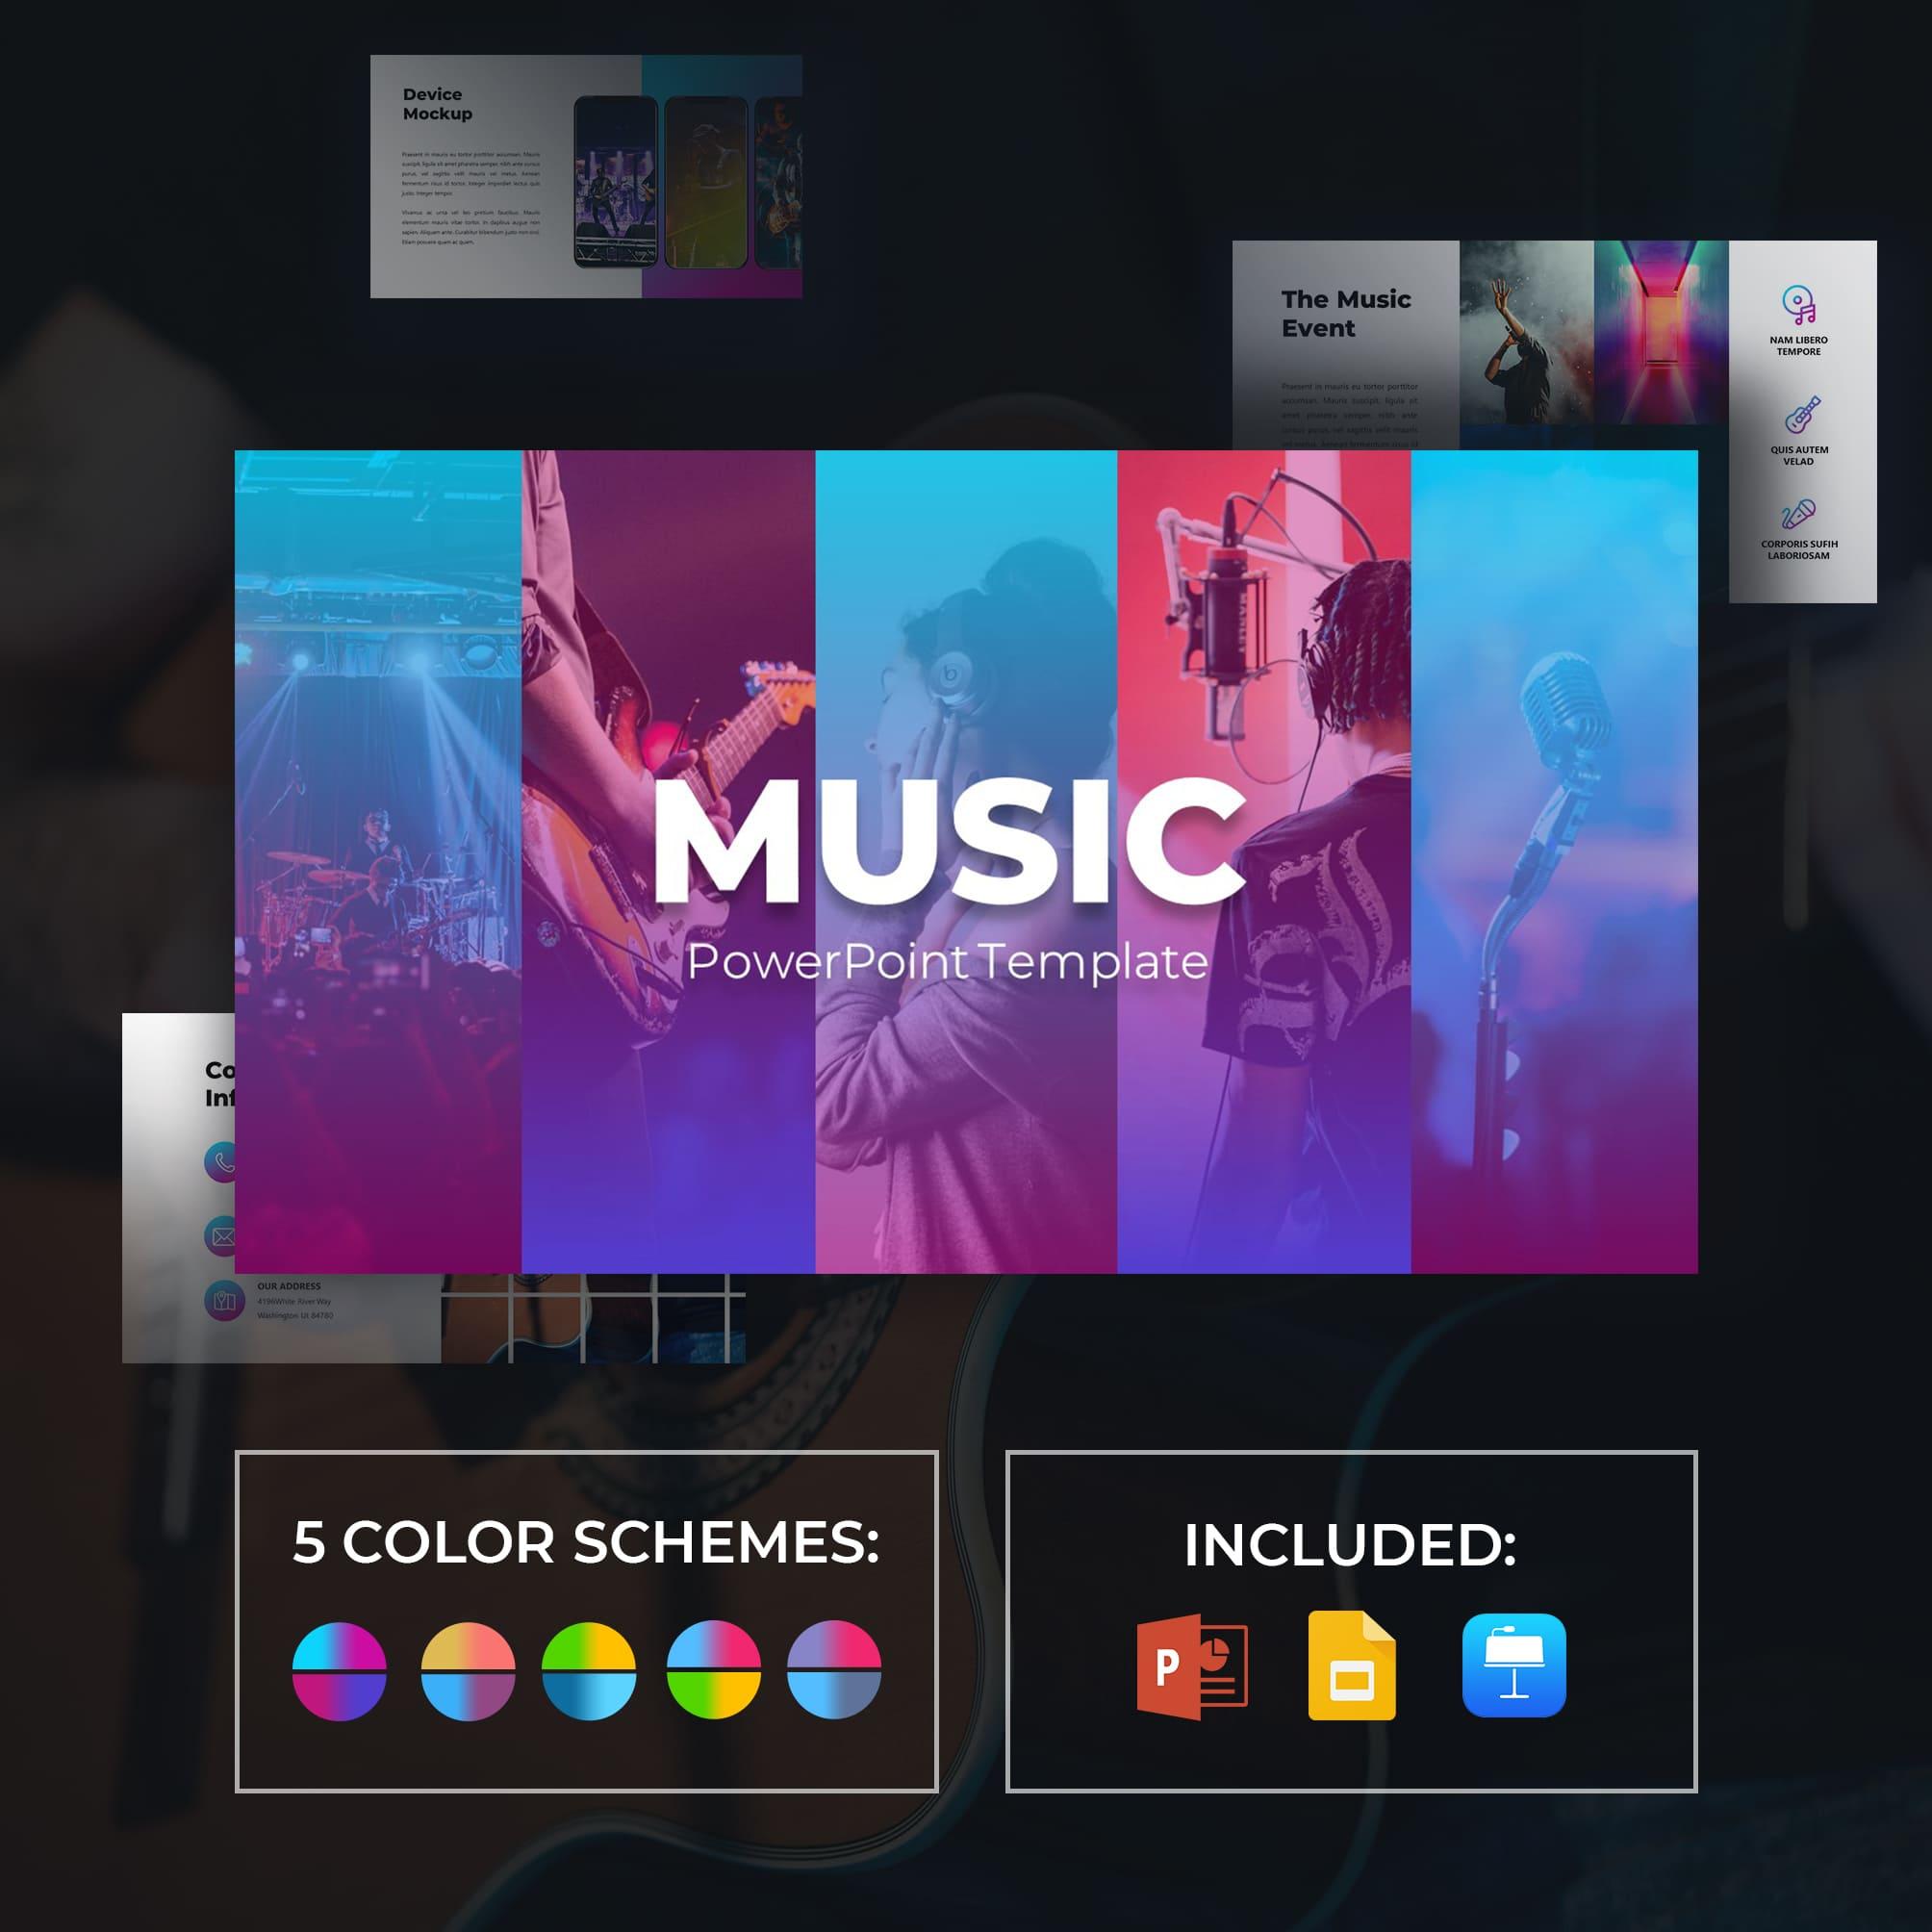 50 Slides Music Presentation Template 2021: Powerpoint, Google Slides & Keynote.